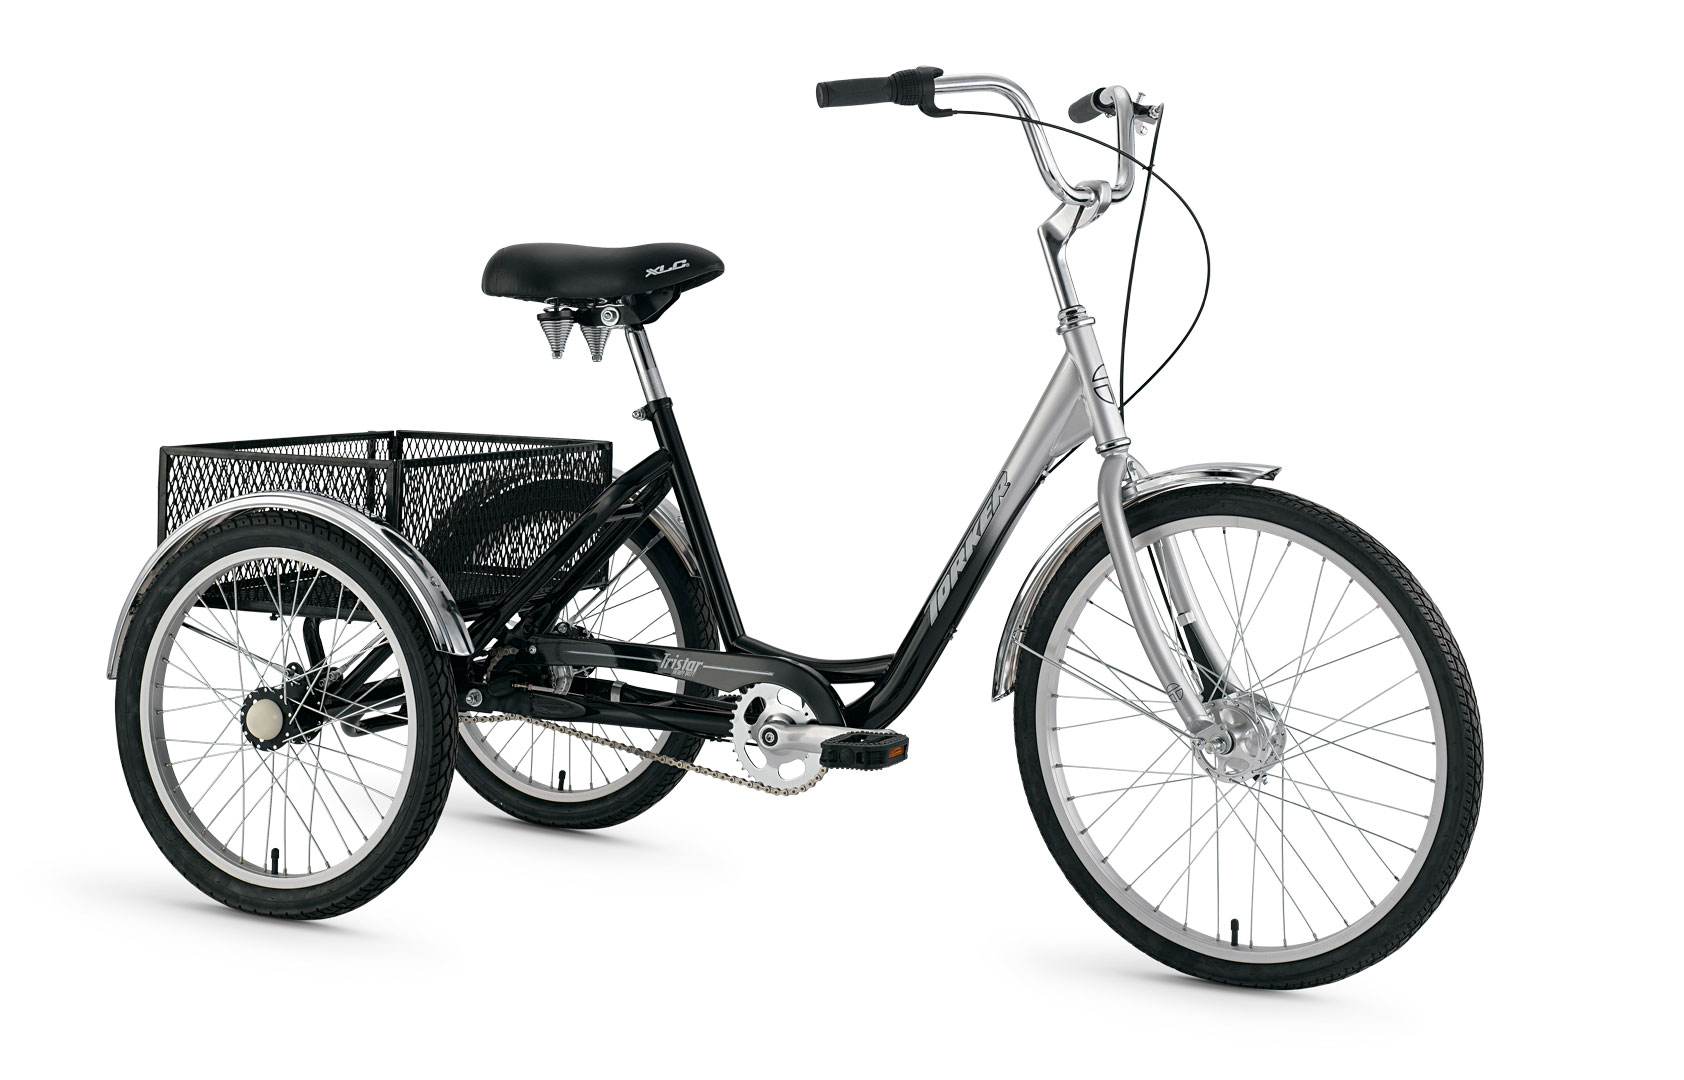 Summit Industrial Trike 500lb Load Capacity! Walt's Cycle, Sunnyvale, CA